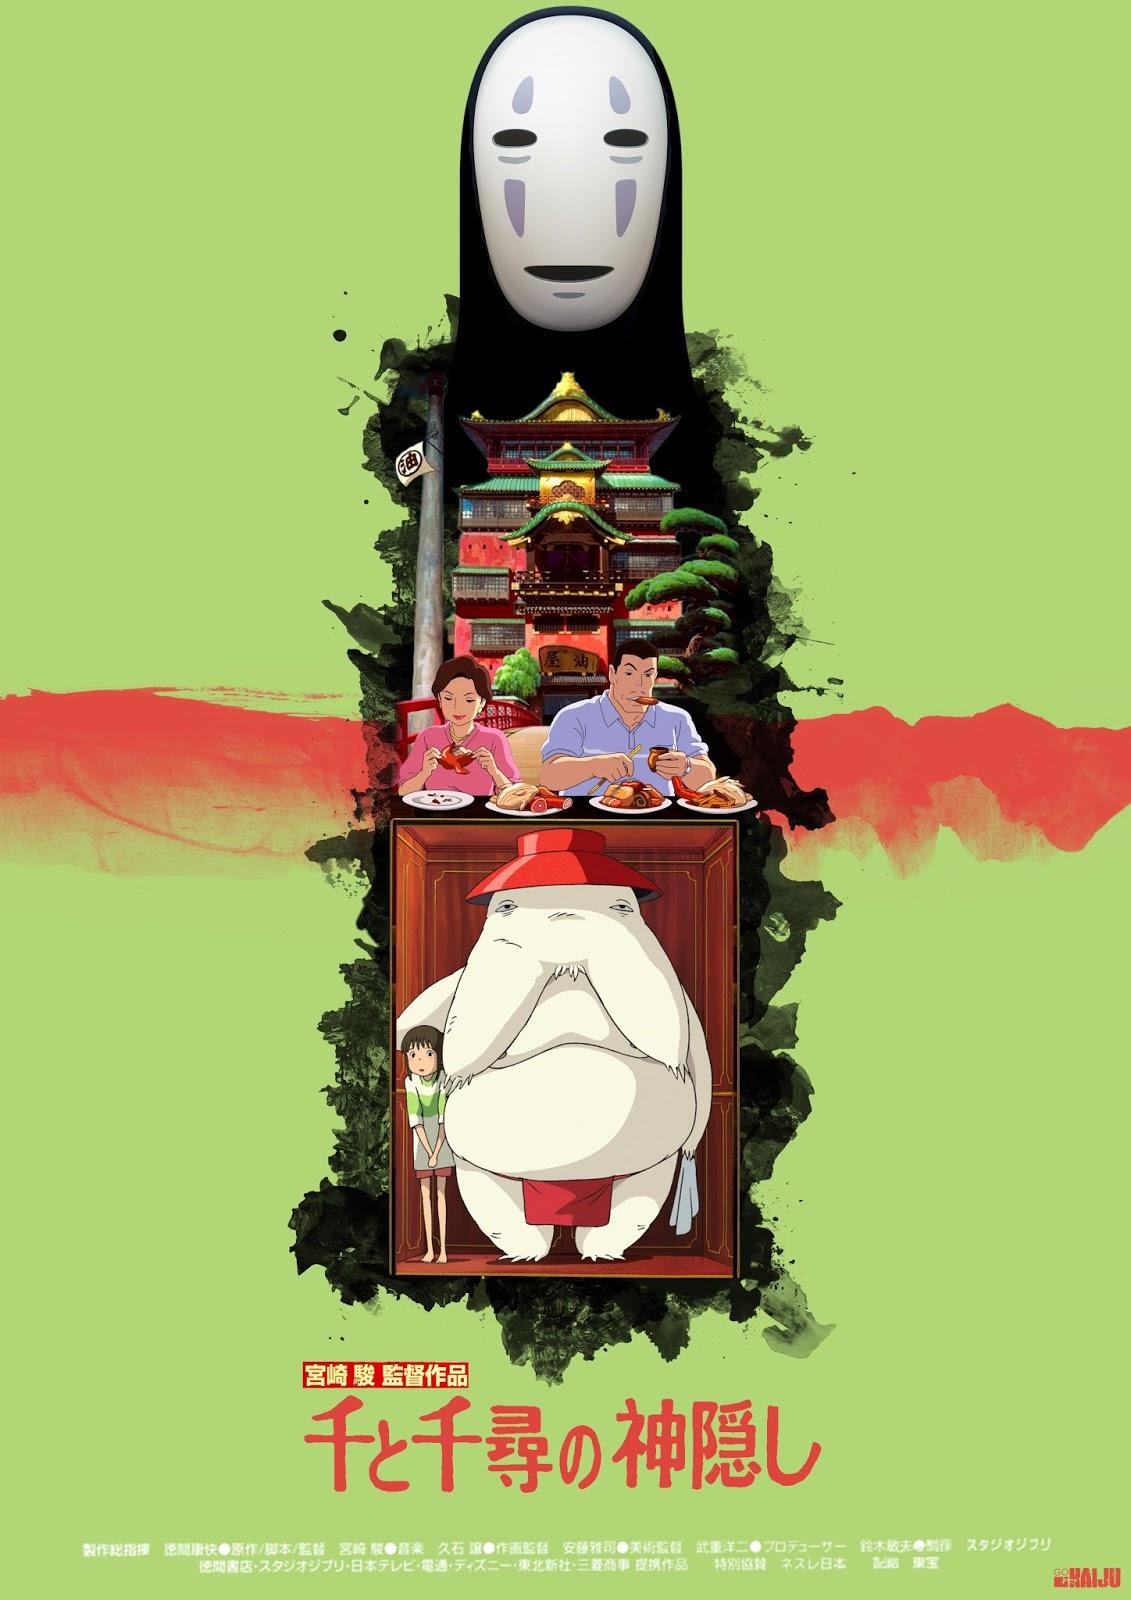 Le Voyage De Chihiro Personnages : voyage, chihiro, personnages, Gokaiju:, Voyage, Chihiro, Magnolia, Ghost, Shell